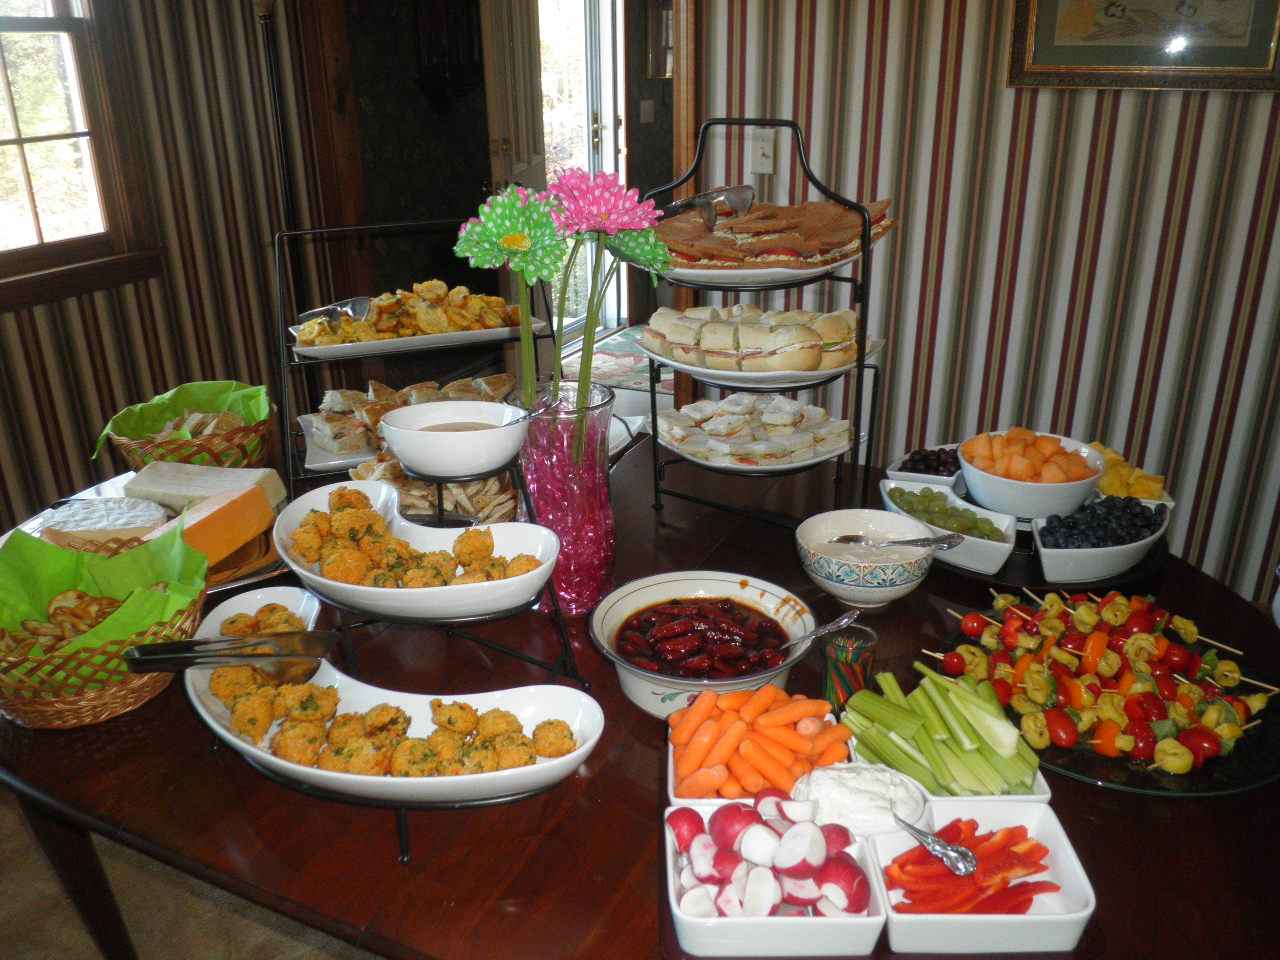 Baby Shower Food Ideas: Baby Shower Food Buffet Ideas